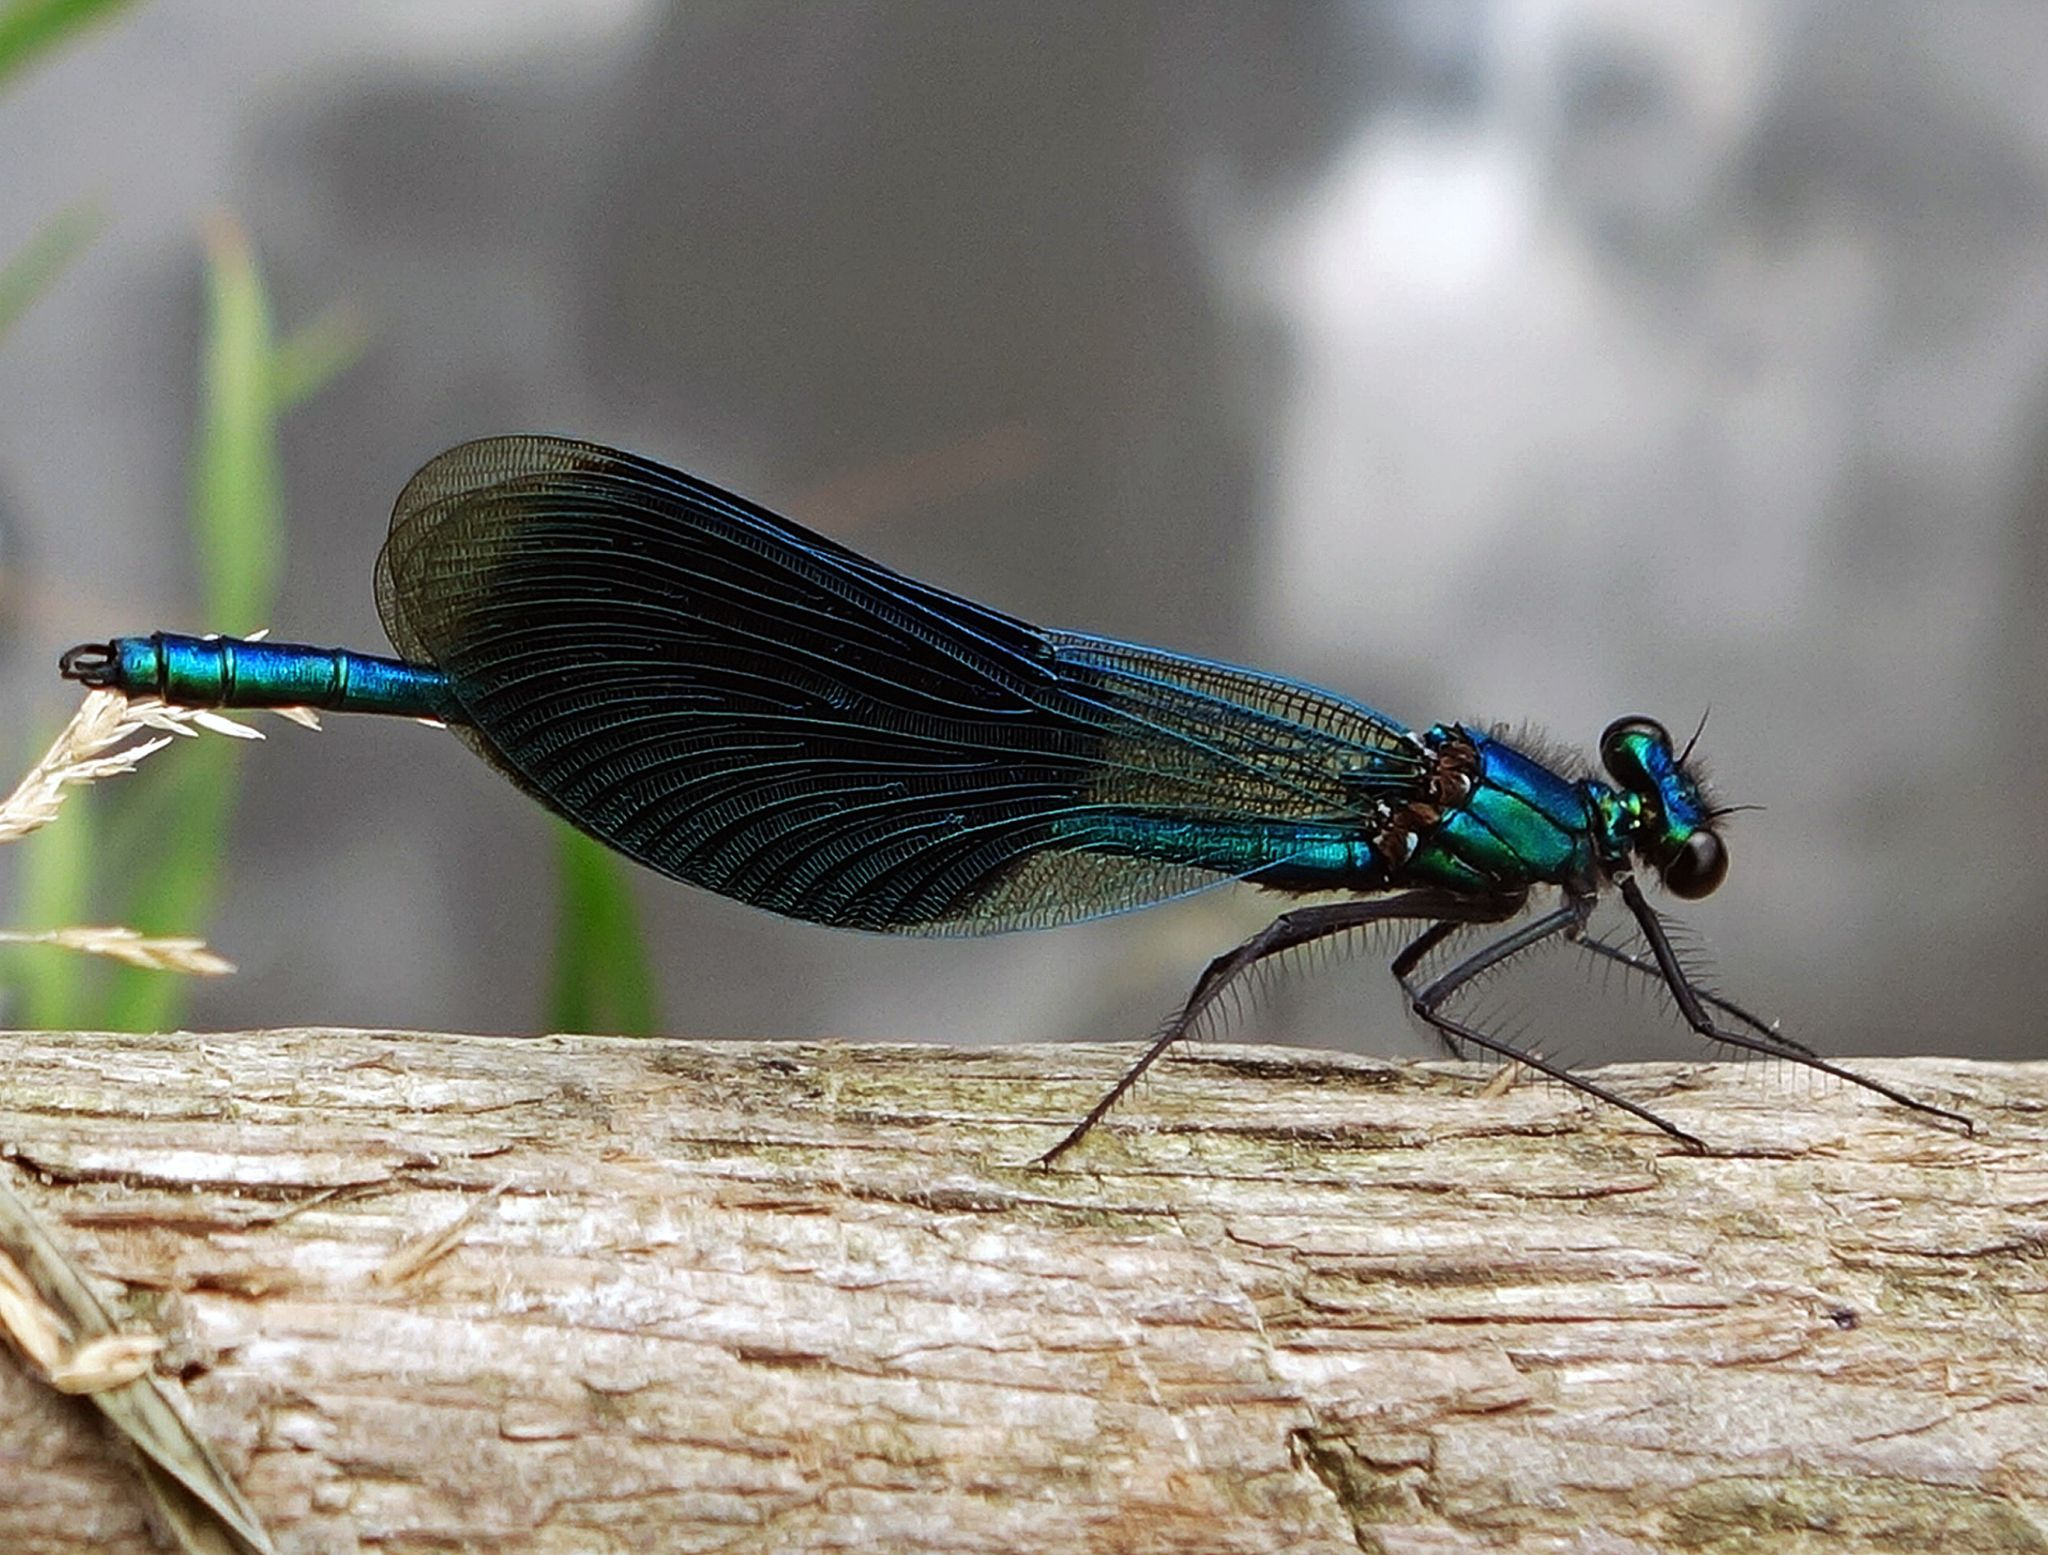 Dragonfly in Odijk by hugodejong35